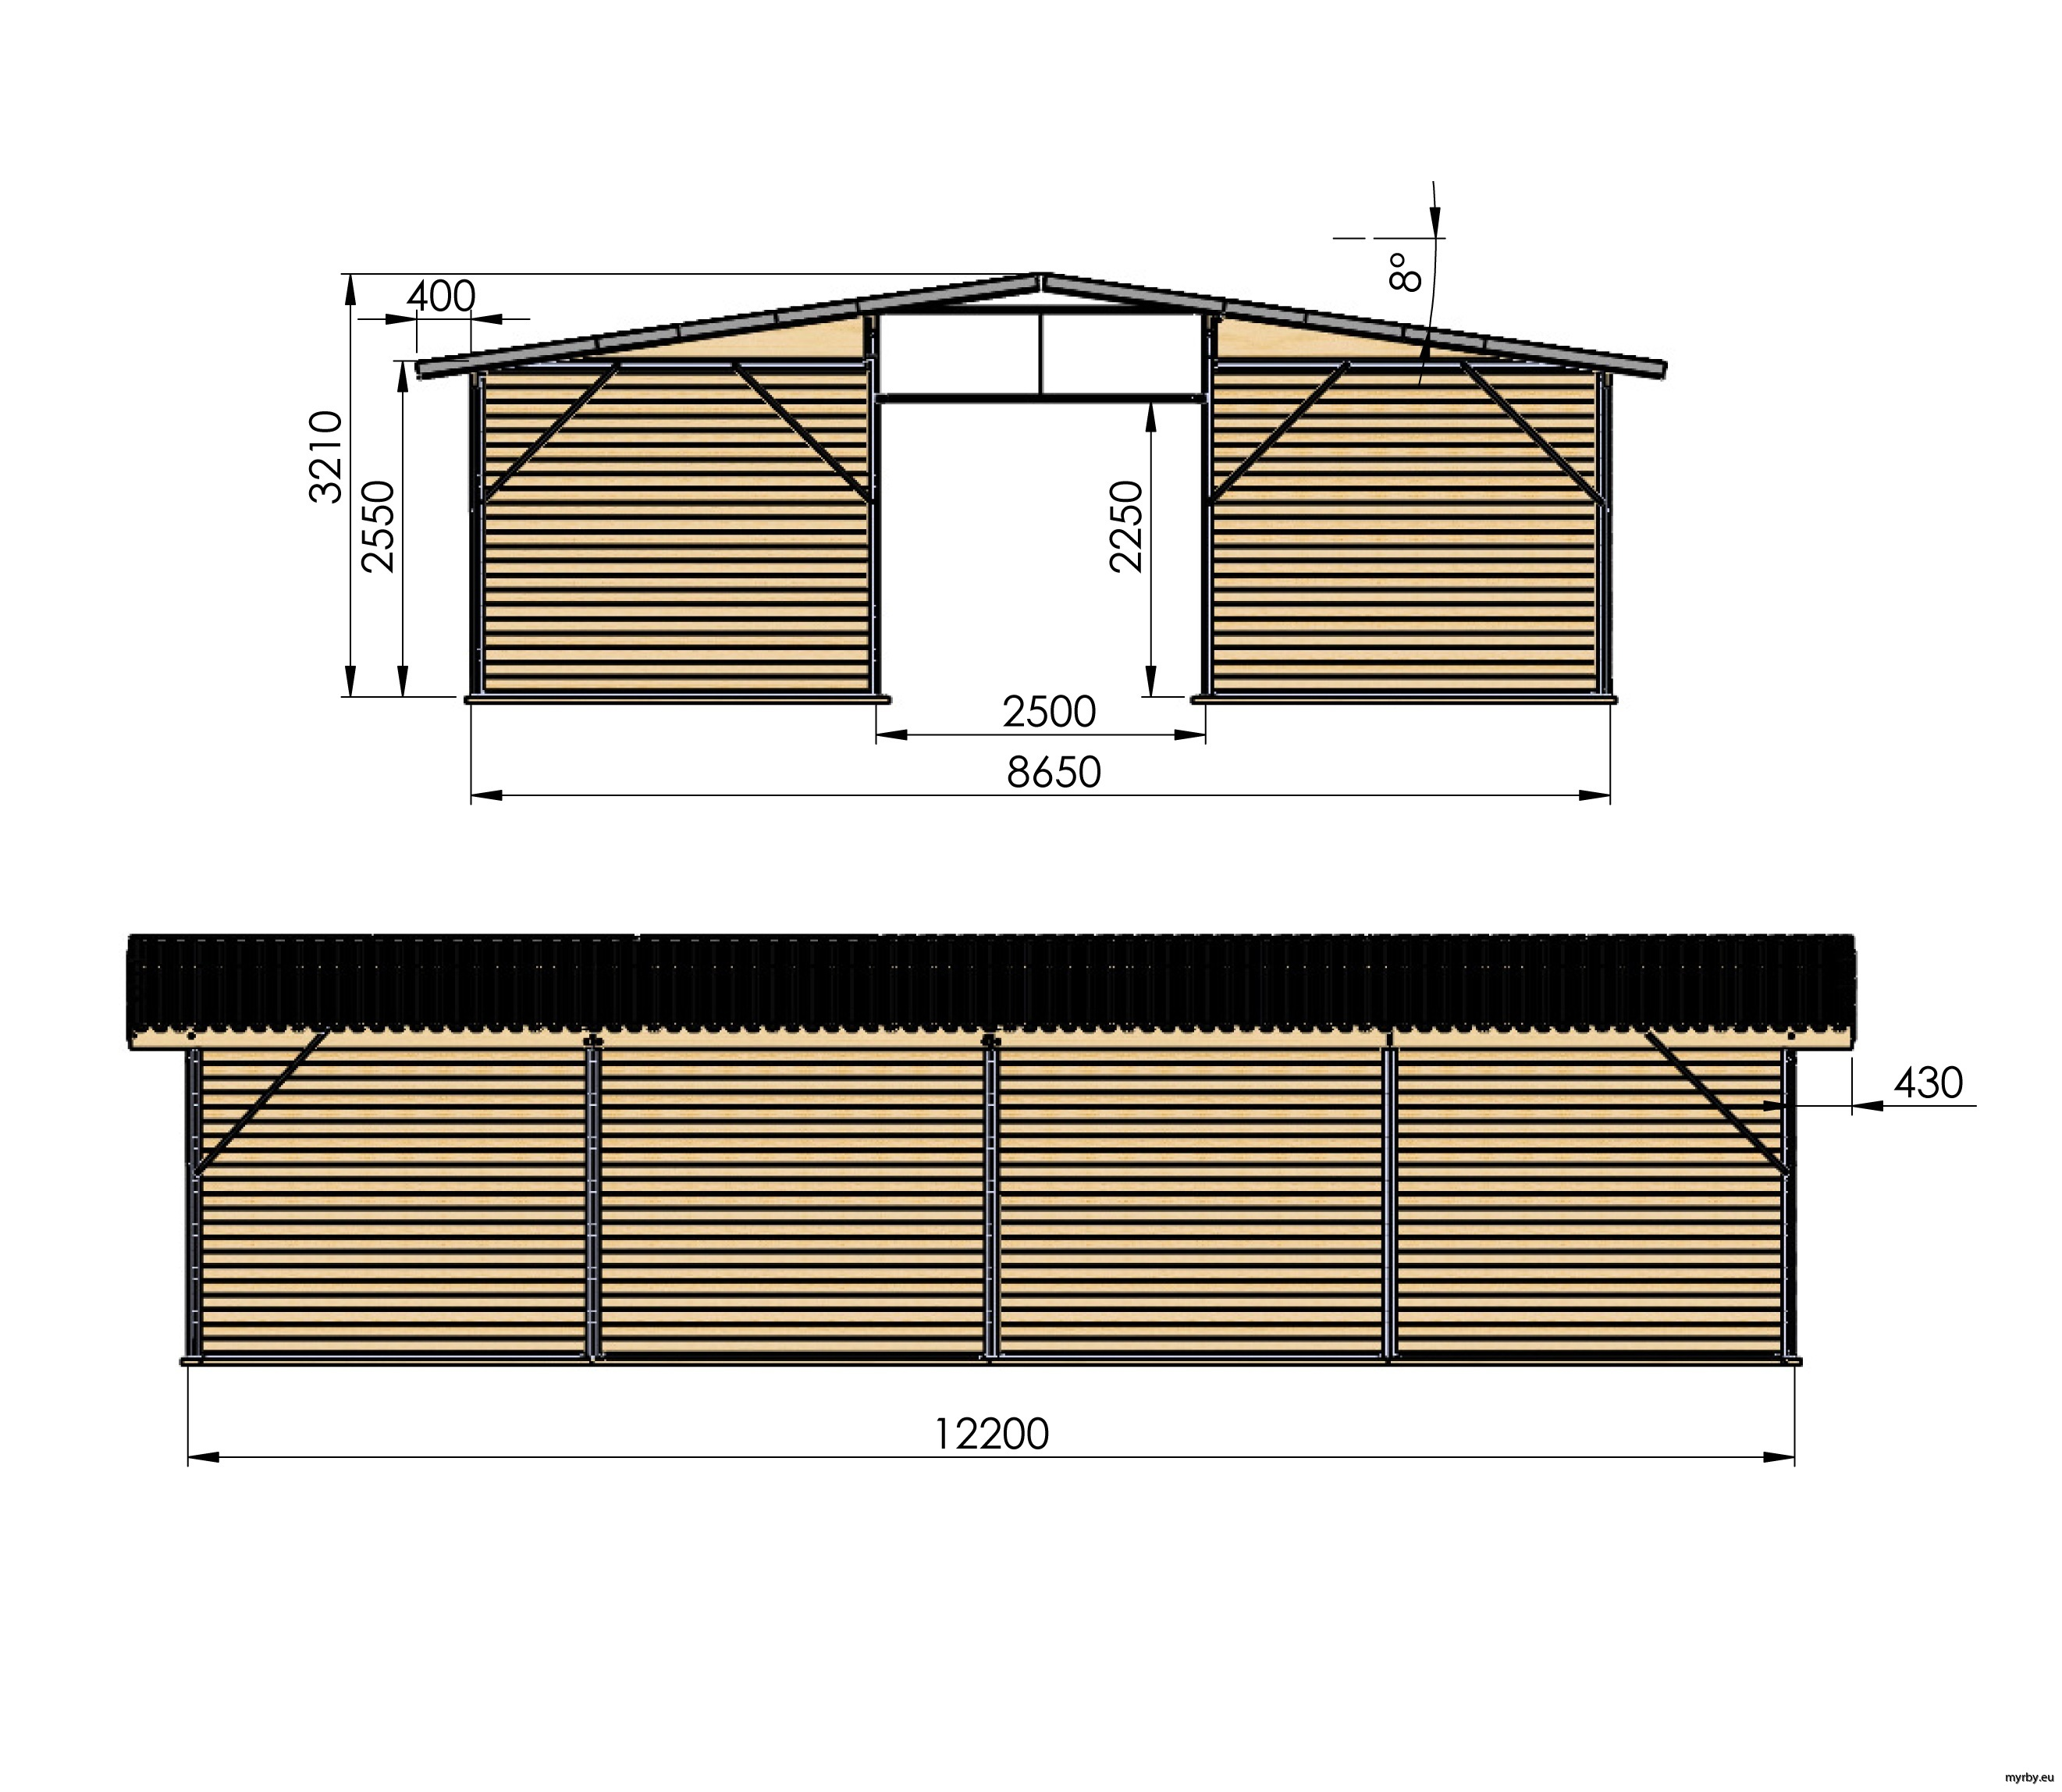 14209-17 Ligghall 104 m² Mått